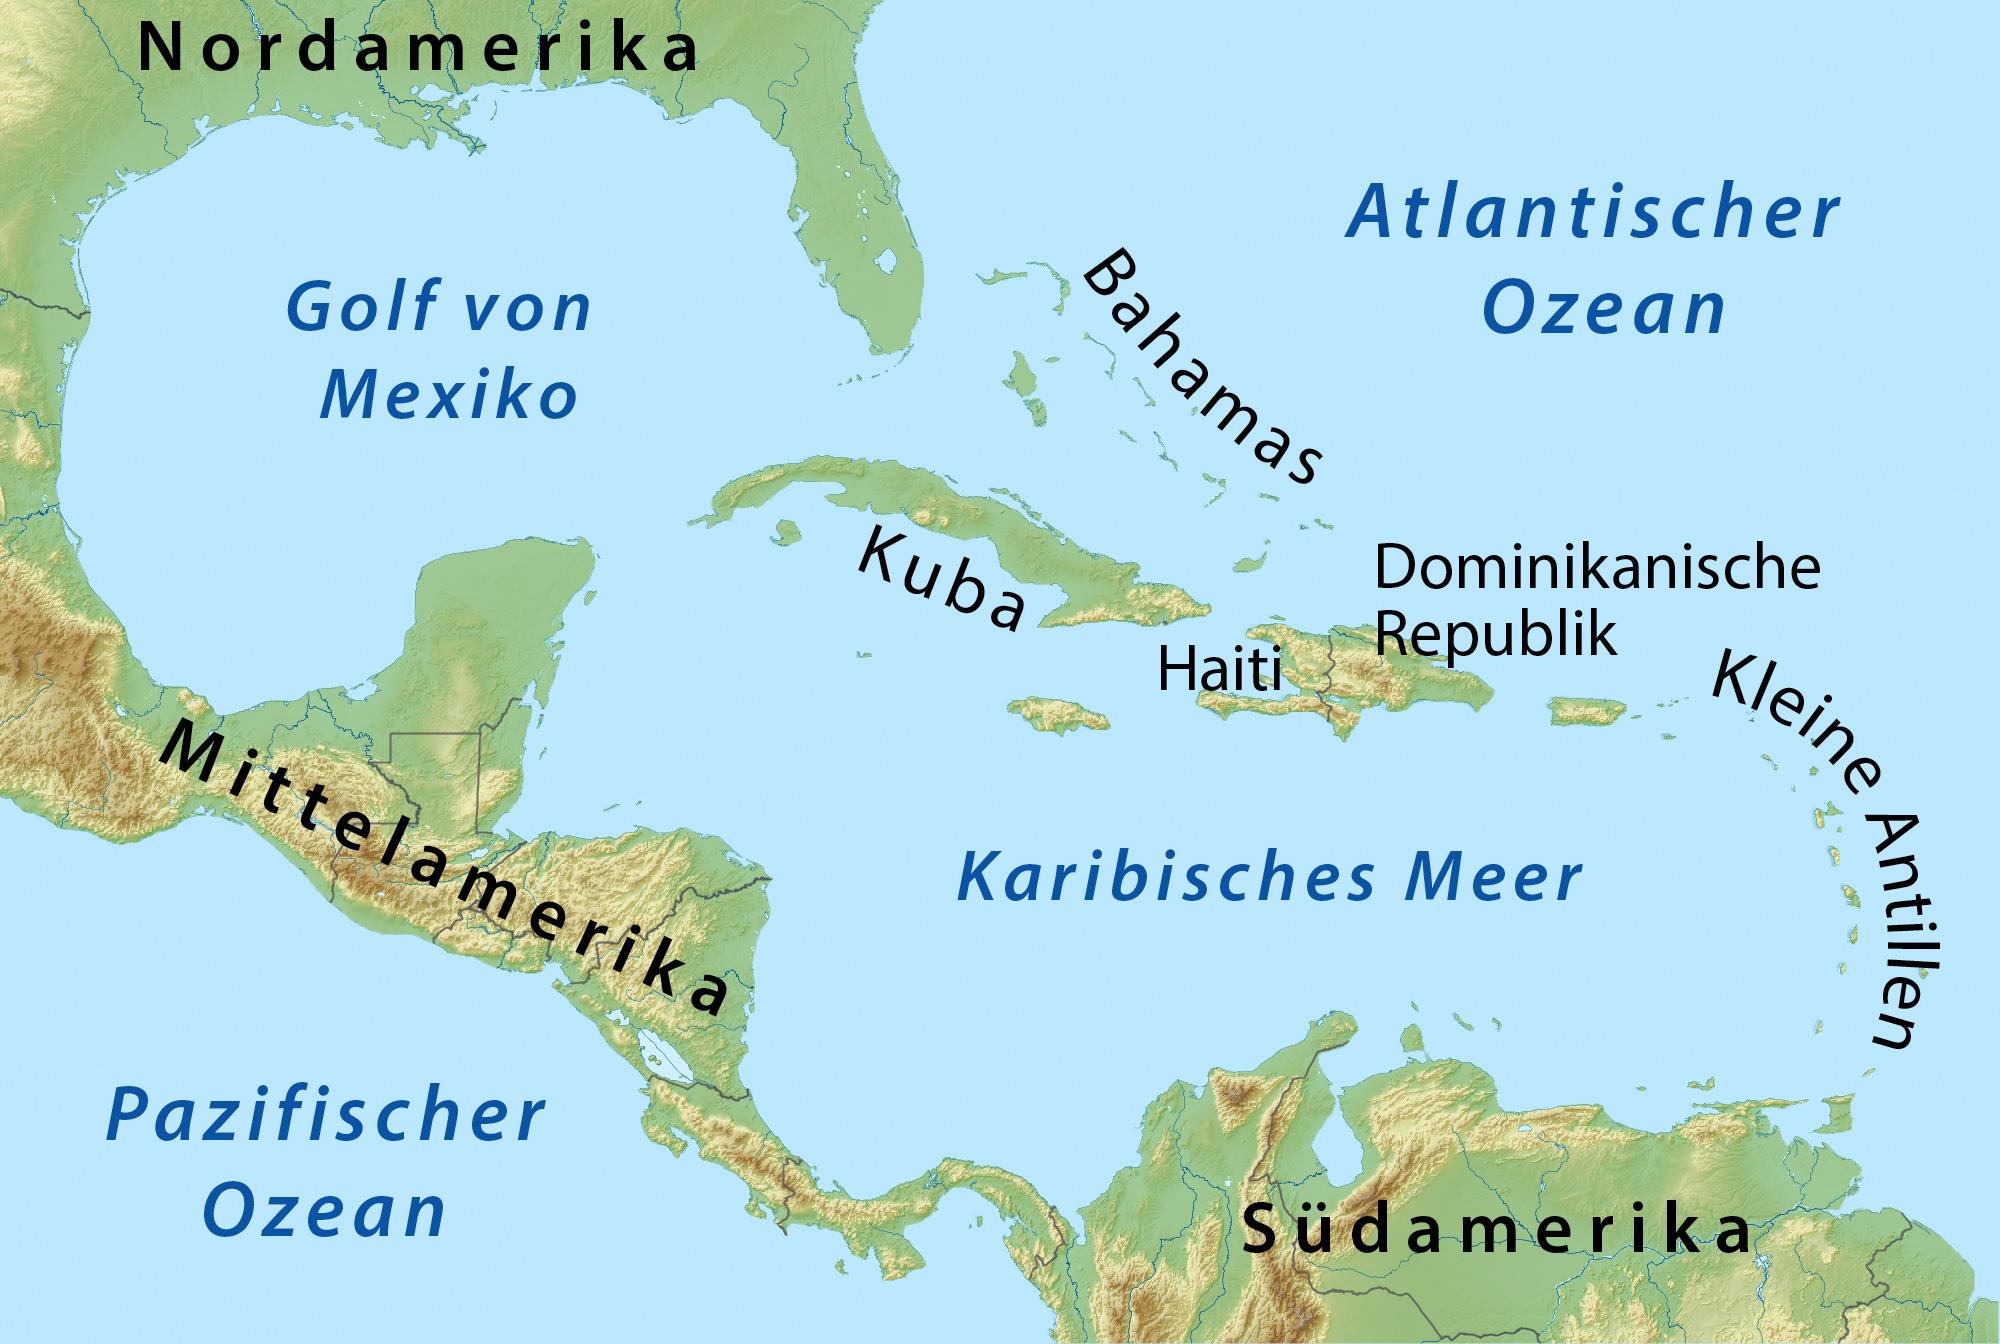 Karibik Karte.Datei Karte Karibik Für Klexikon Jpg Wikipedia